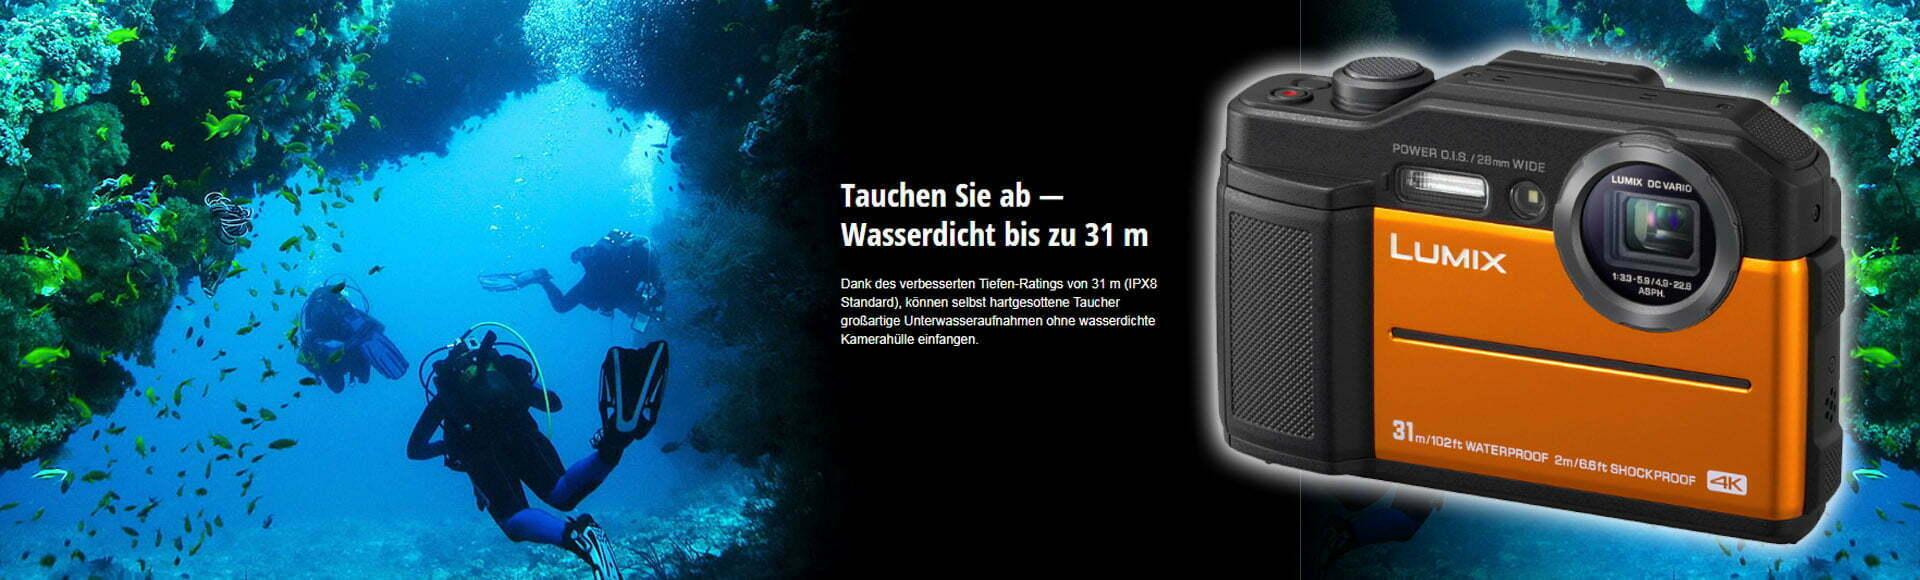 Panasonic Lumix Partner Foto Brinke Gh5 Body Lens Leica 12mm F 14 Asph Ft7 Der Panzer Unter Den Kameras